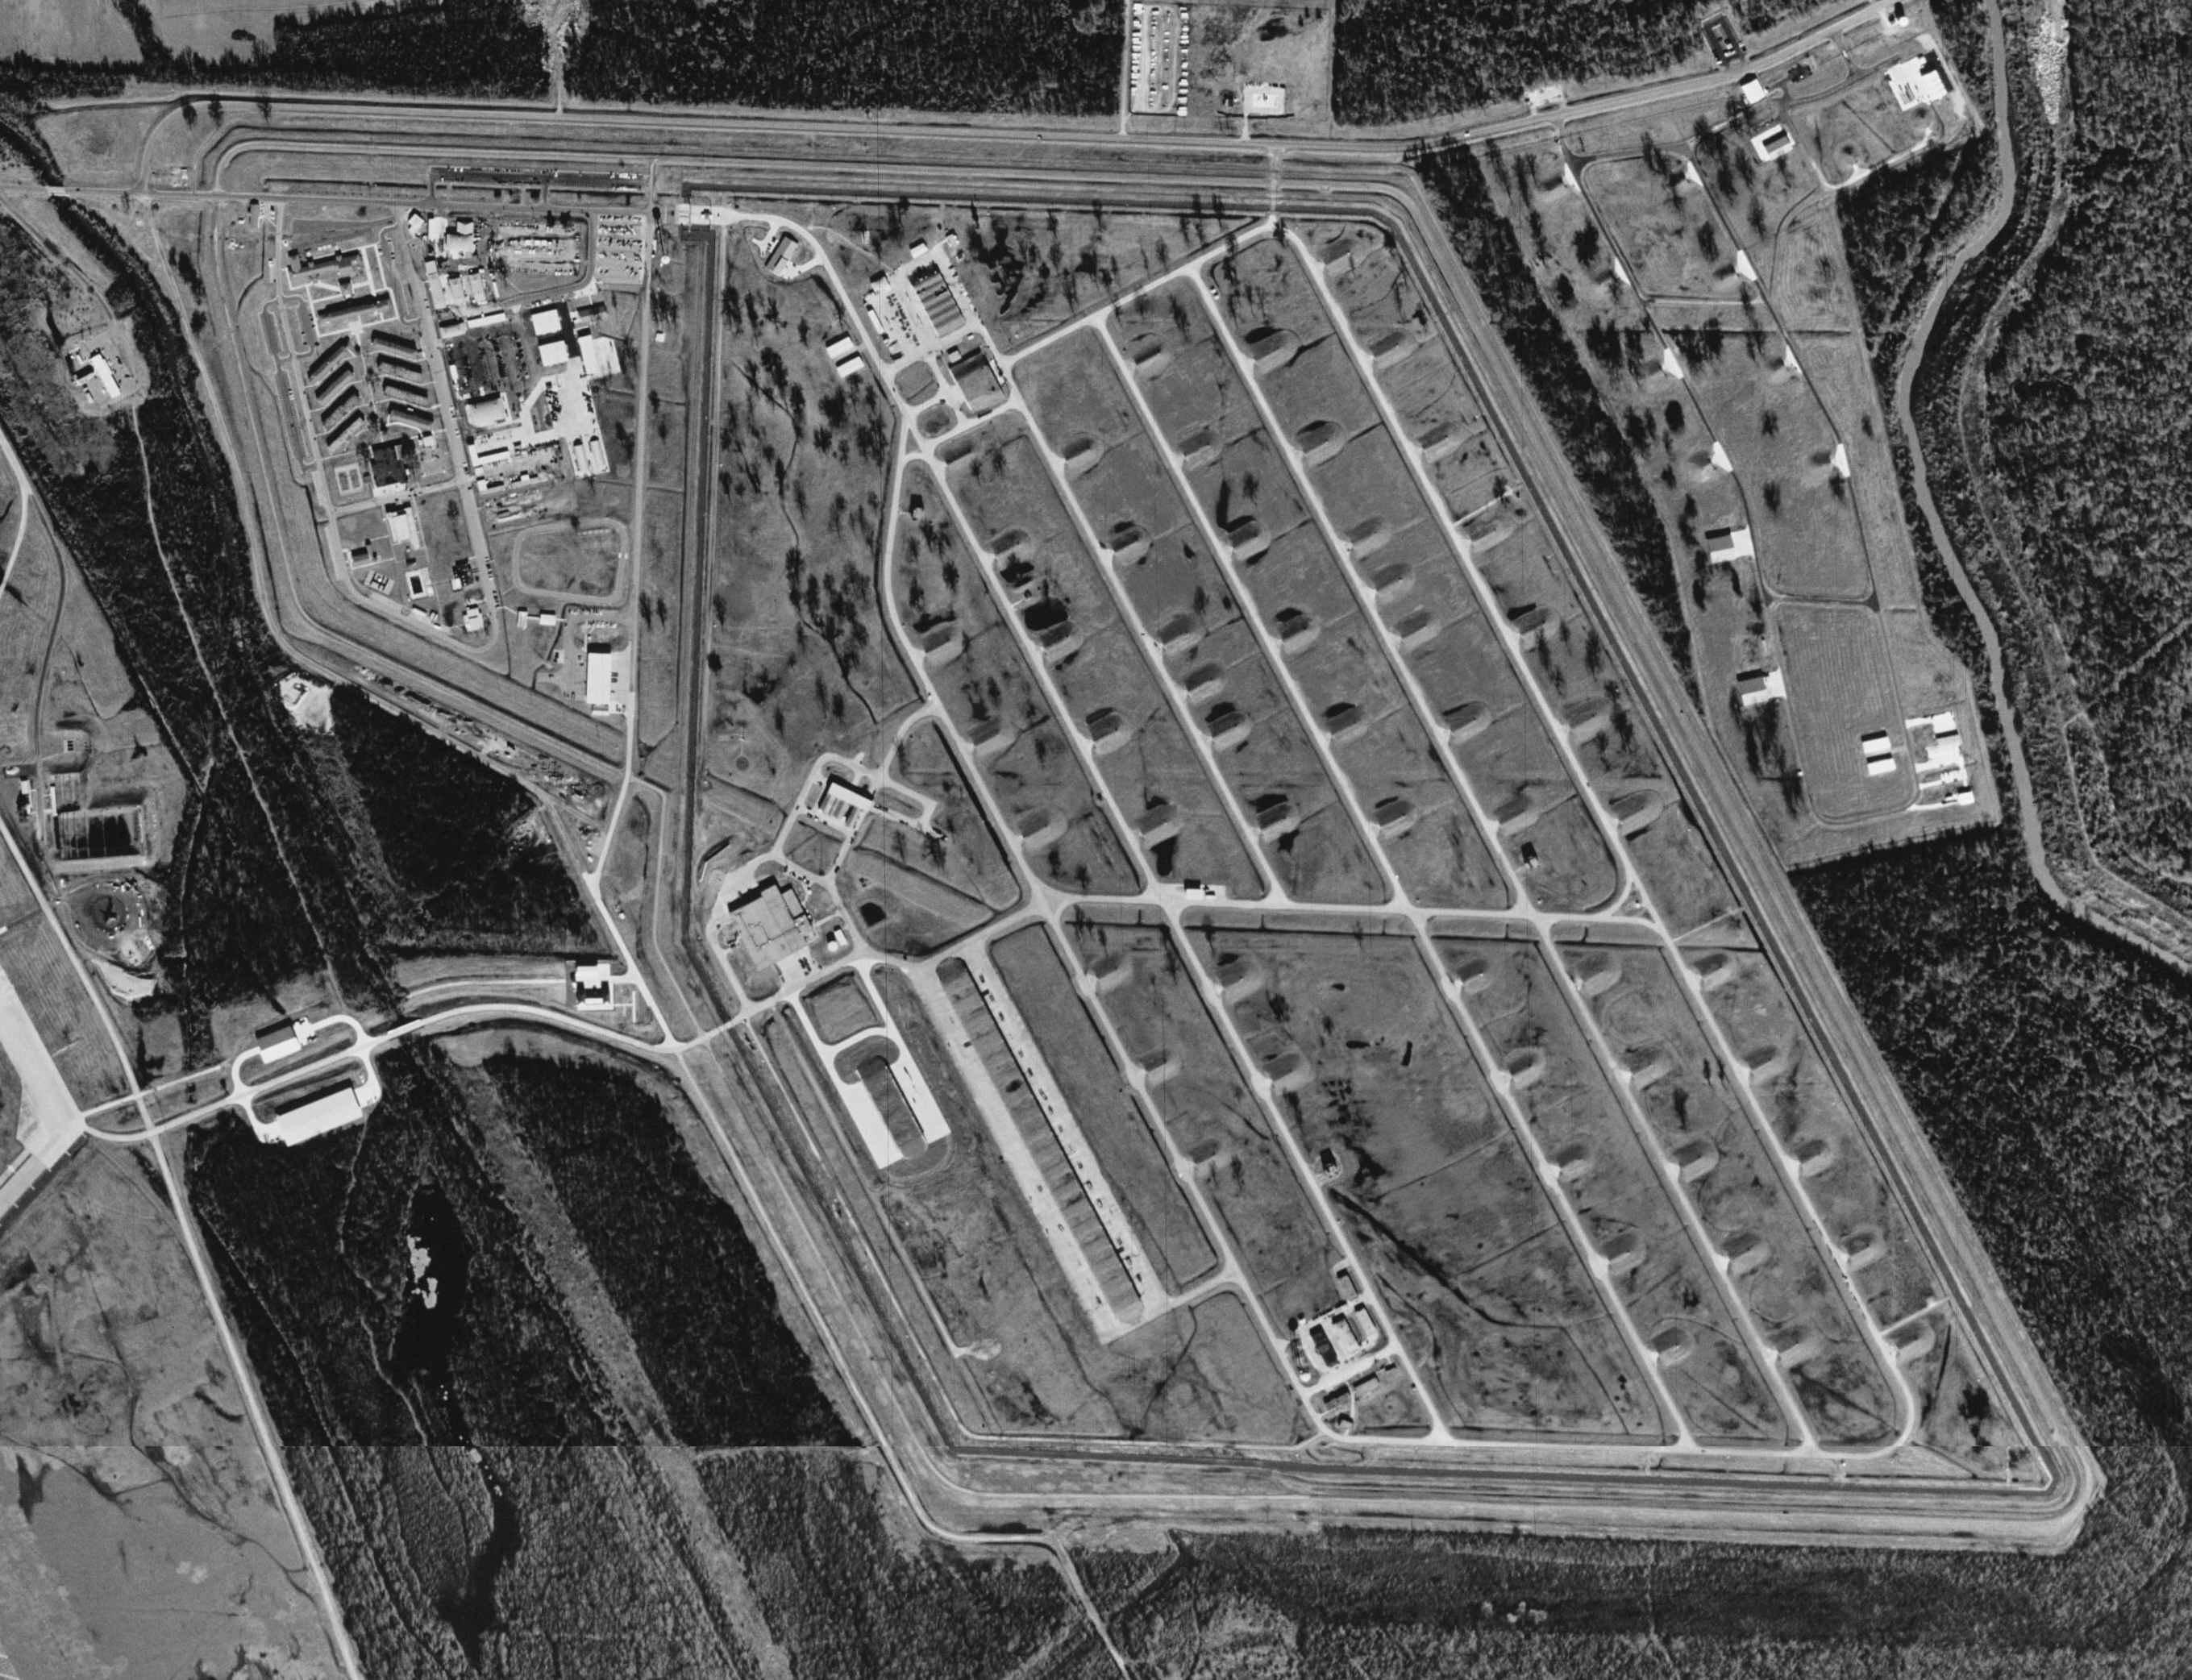 Eyeballing The Barksdale Air Force Base Wsa